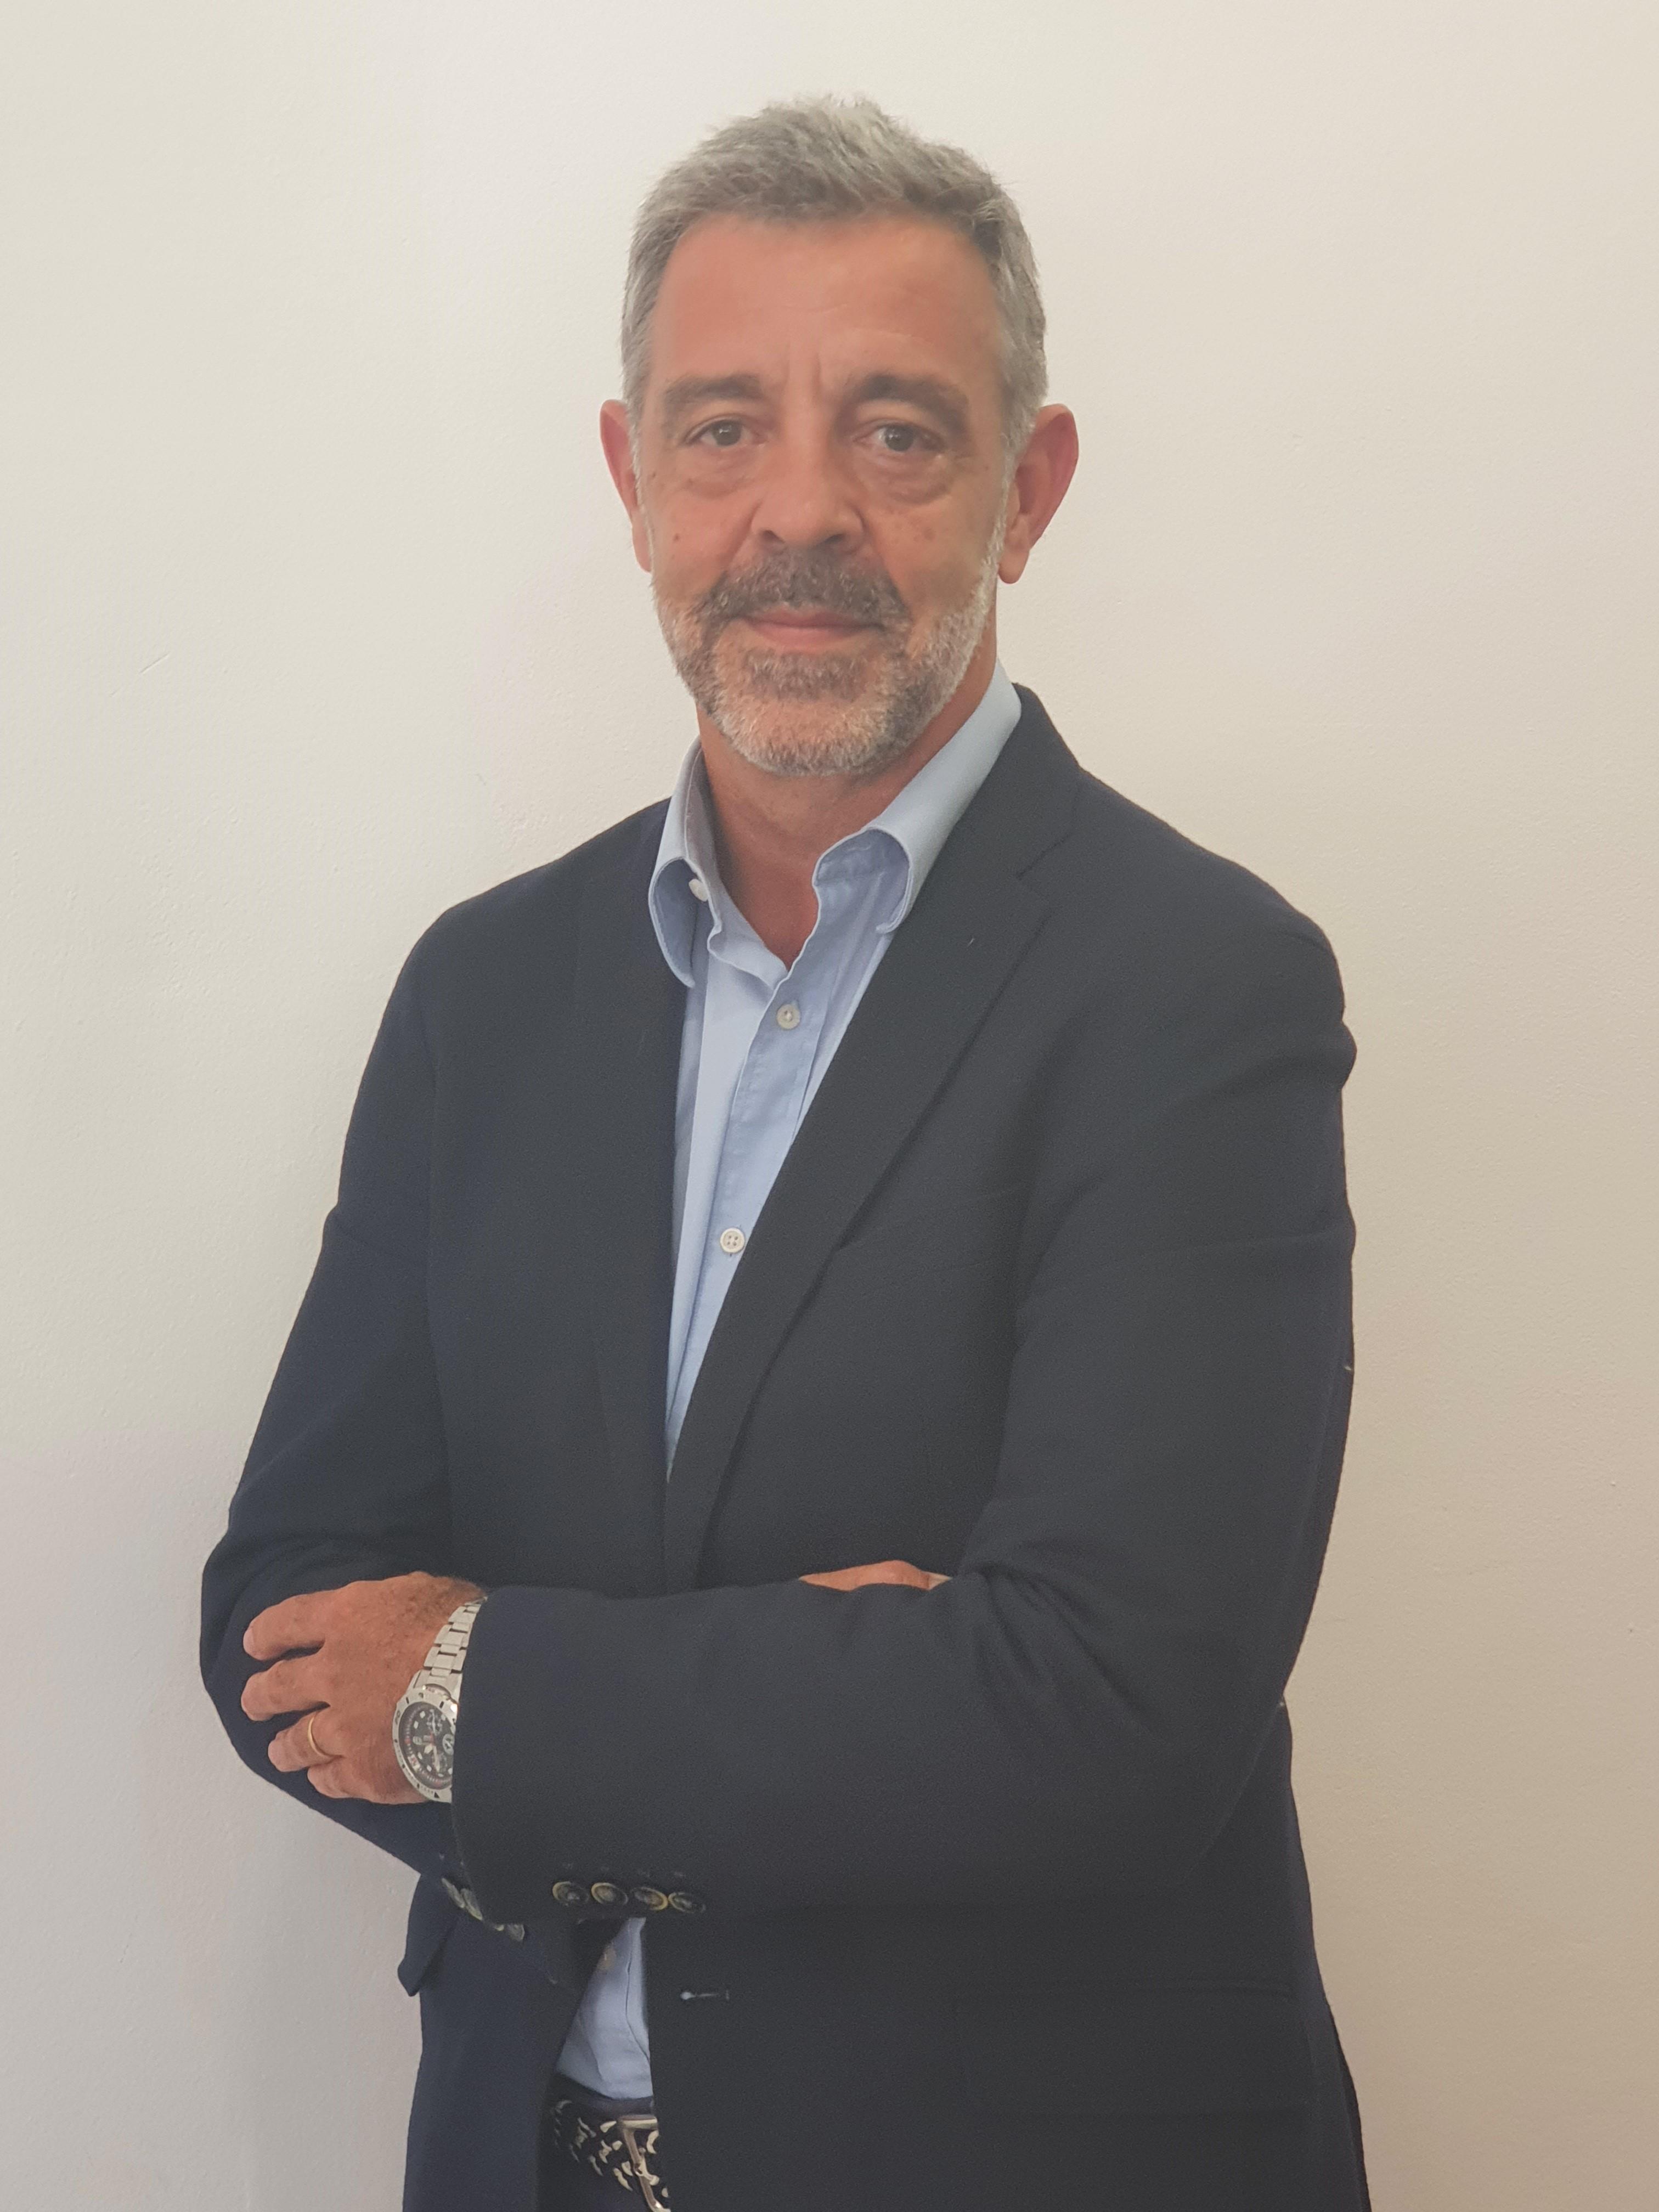 José Luis  Ferrer-Sama Pérez